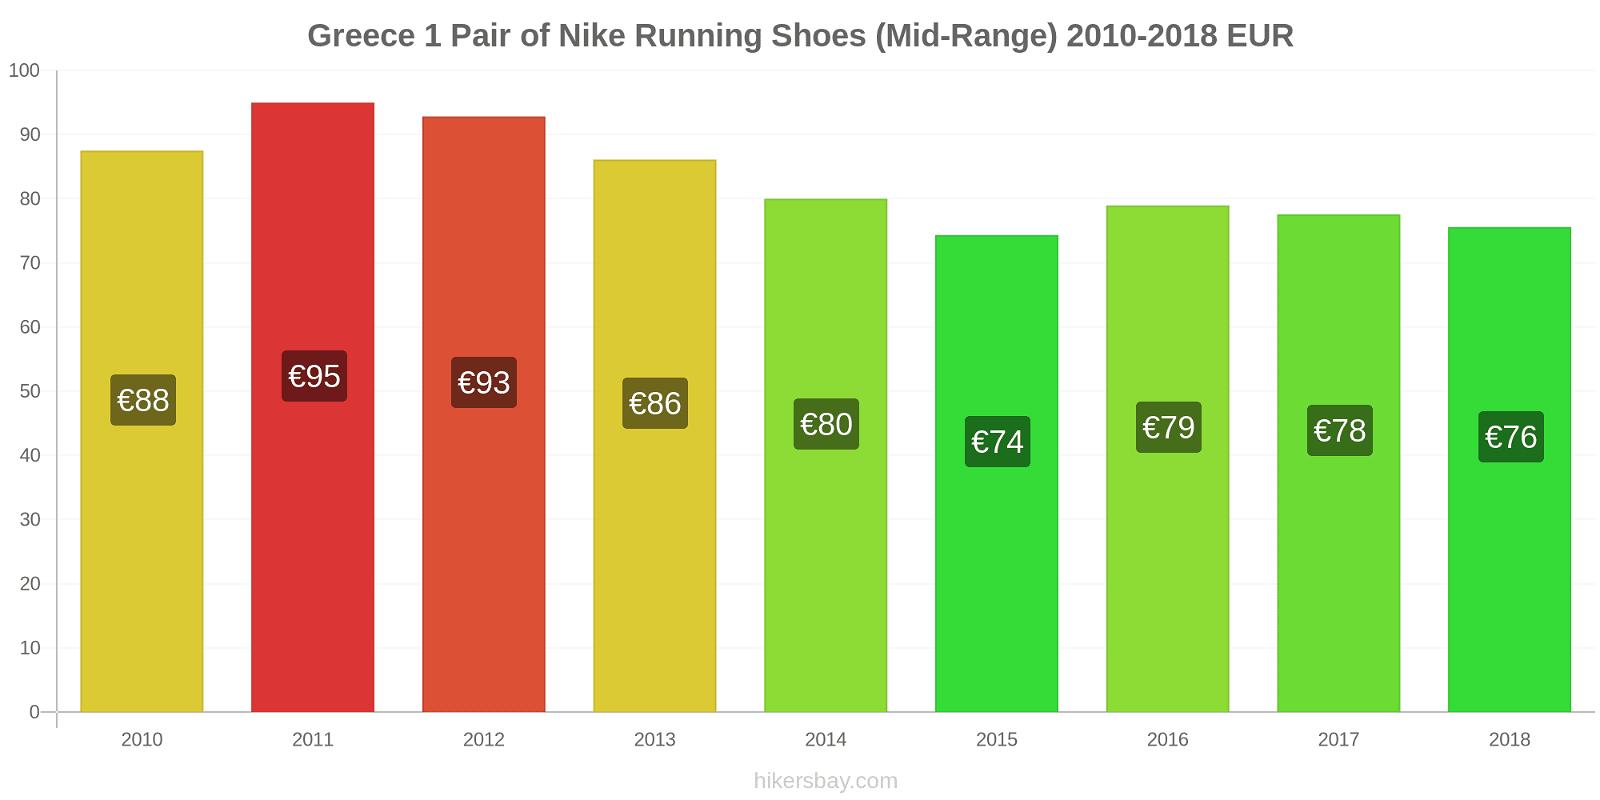 Greece price changes 1 Pair of Nike Running Shoes (Mid-Range) hikersbay.com